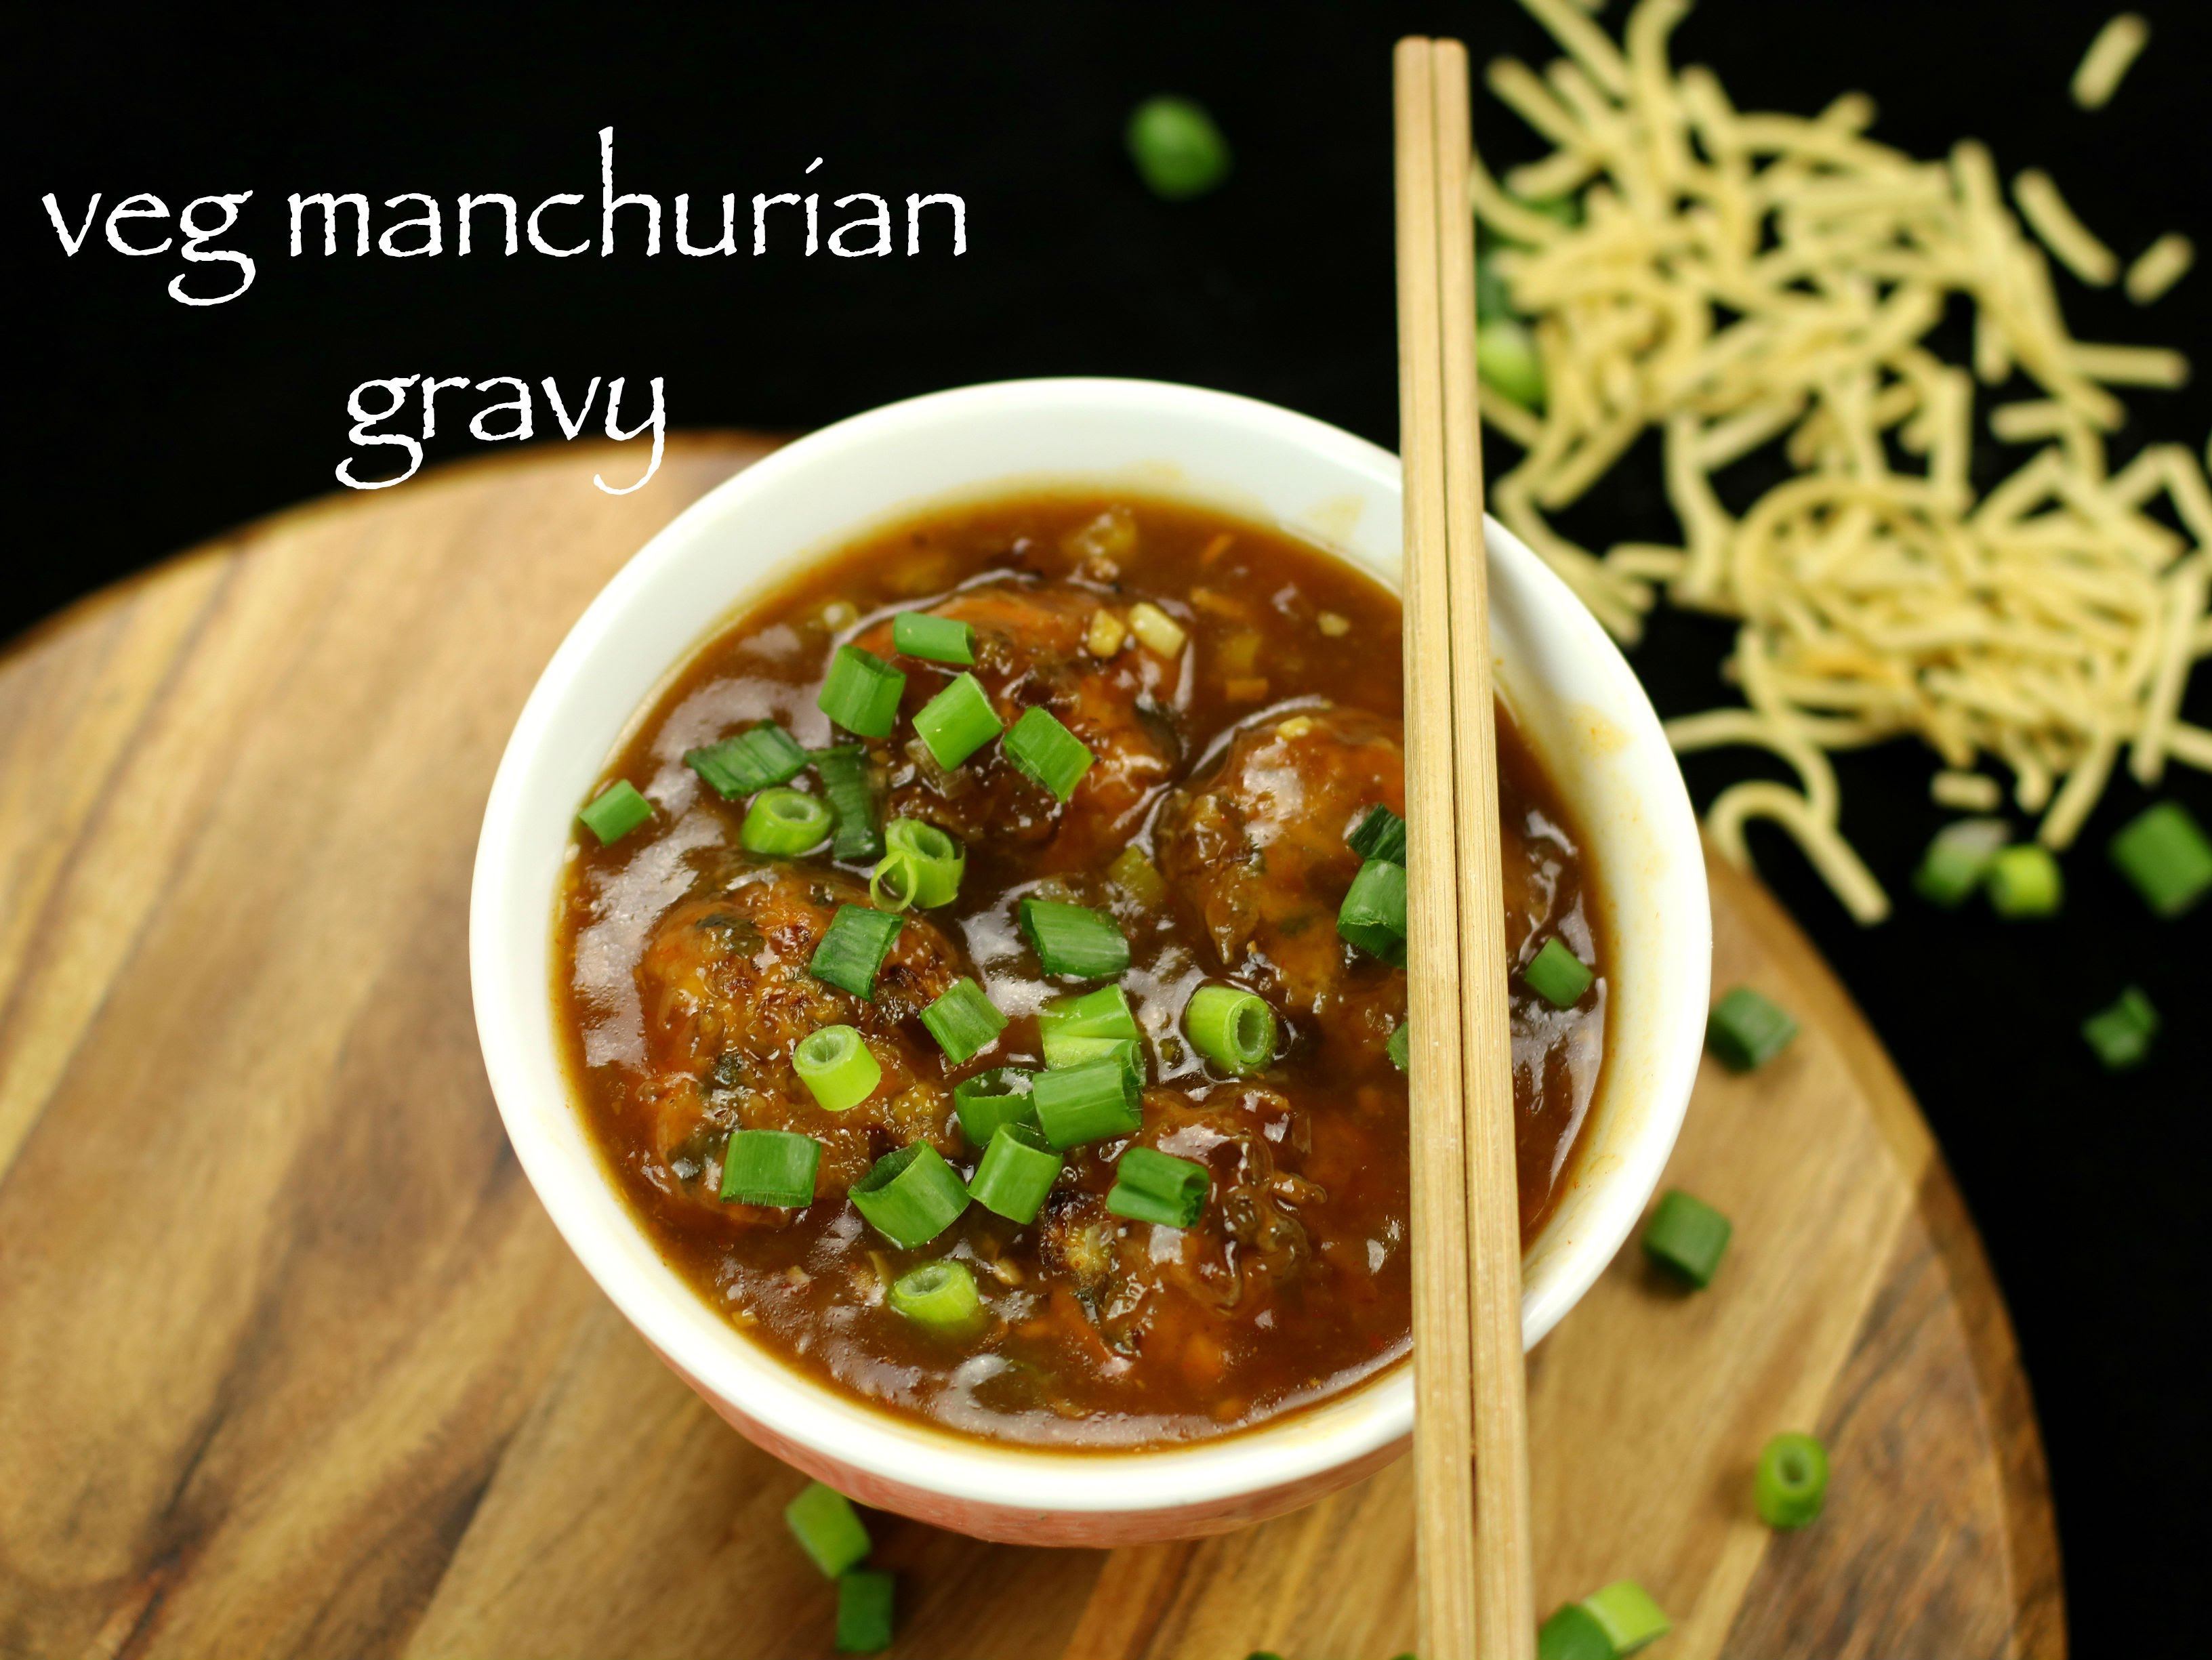 Veg manchurian gravy recipe vegetable manchurian gravy recipe veg manchurian gravy recipe vegetable manchurian gravy recipe cookeryshow forumfinder Gallery